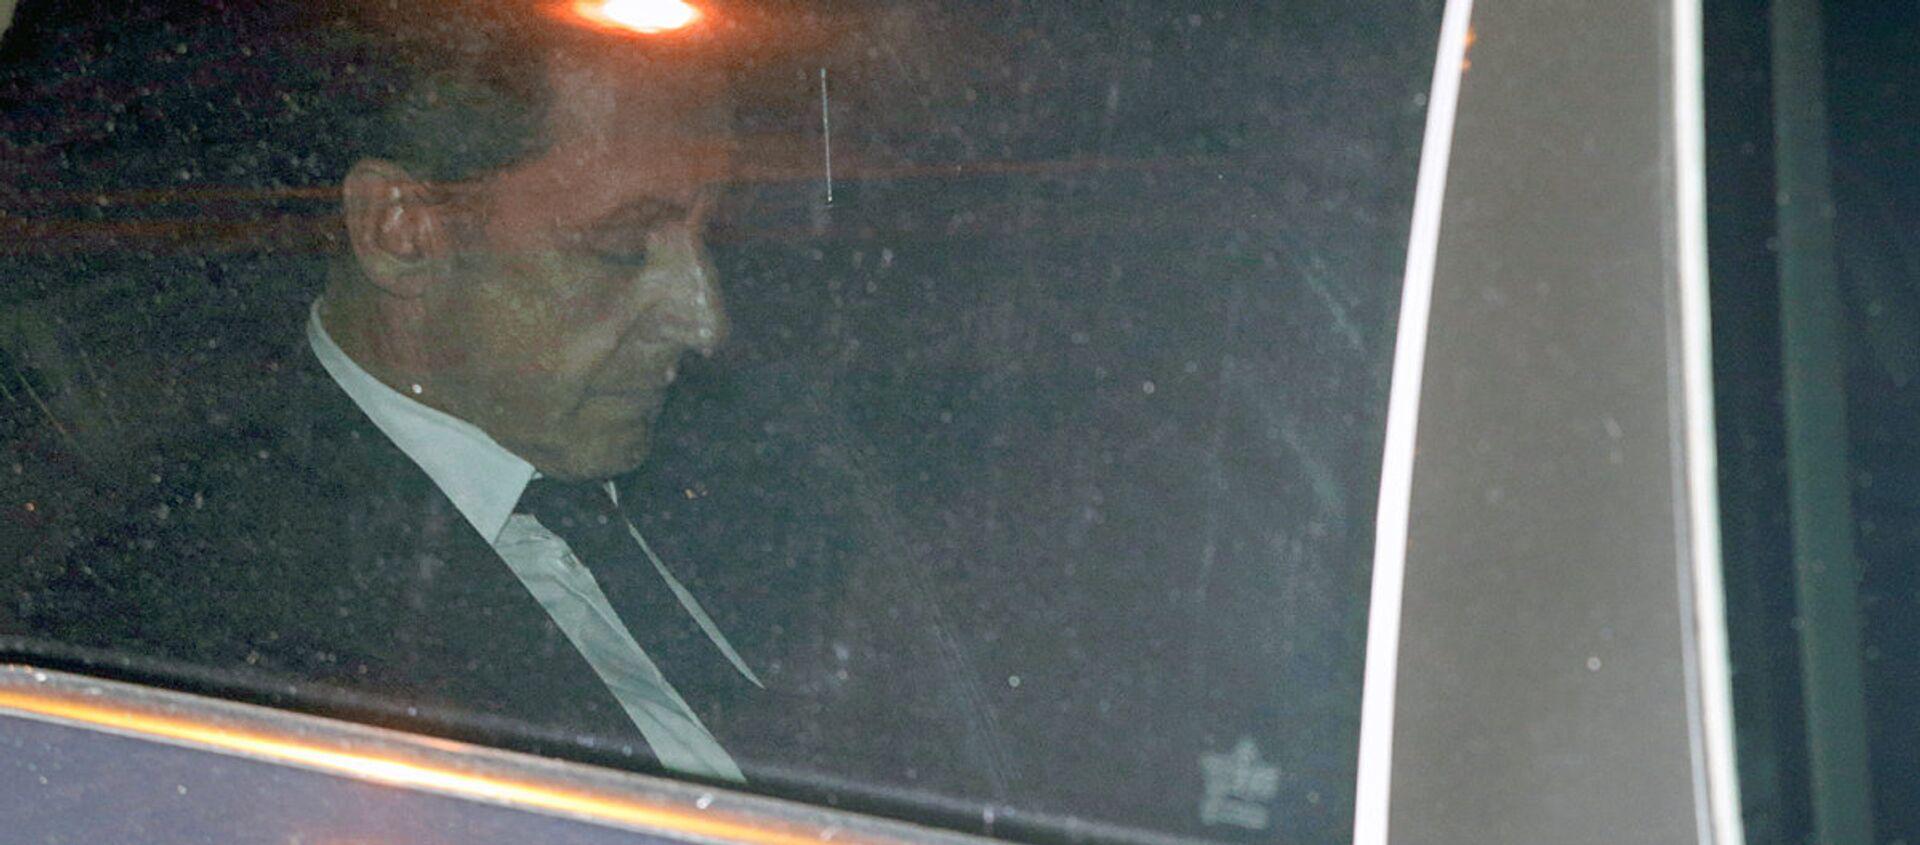 Бывший президент Франции Николя Саркози - Sputnik Узбекистан, 1920, 01.03.2021